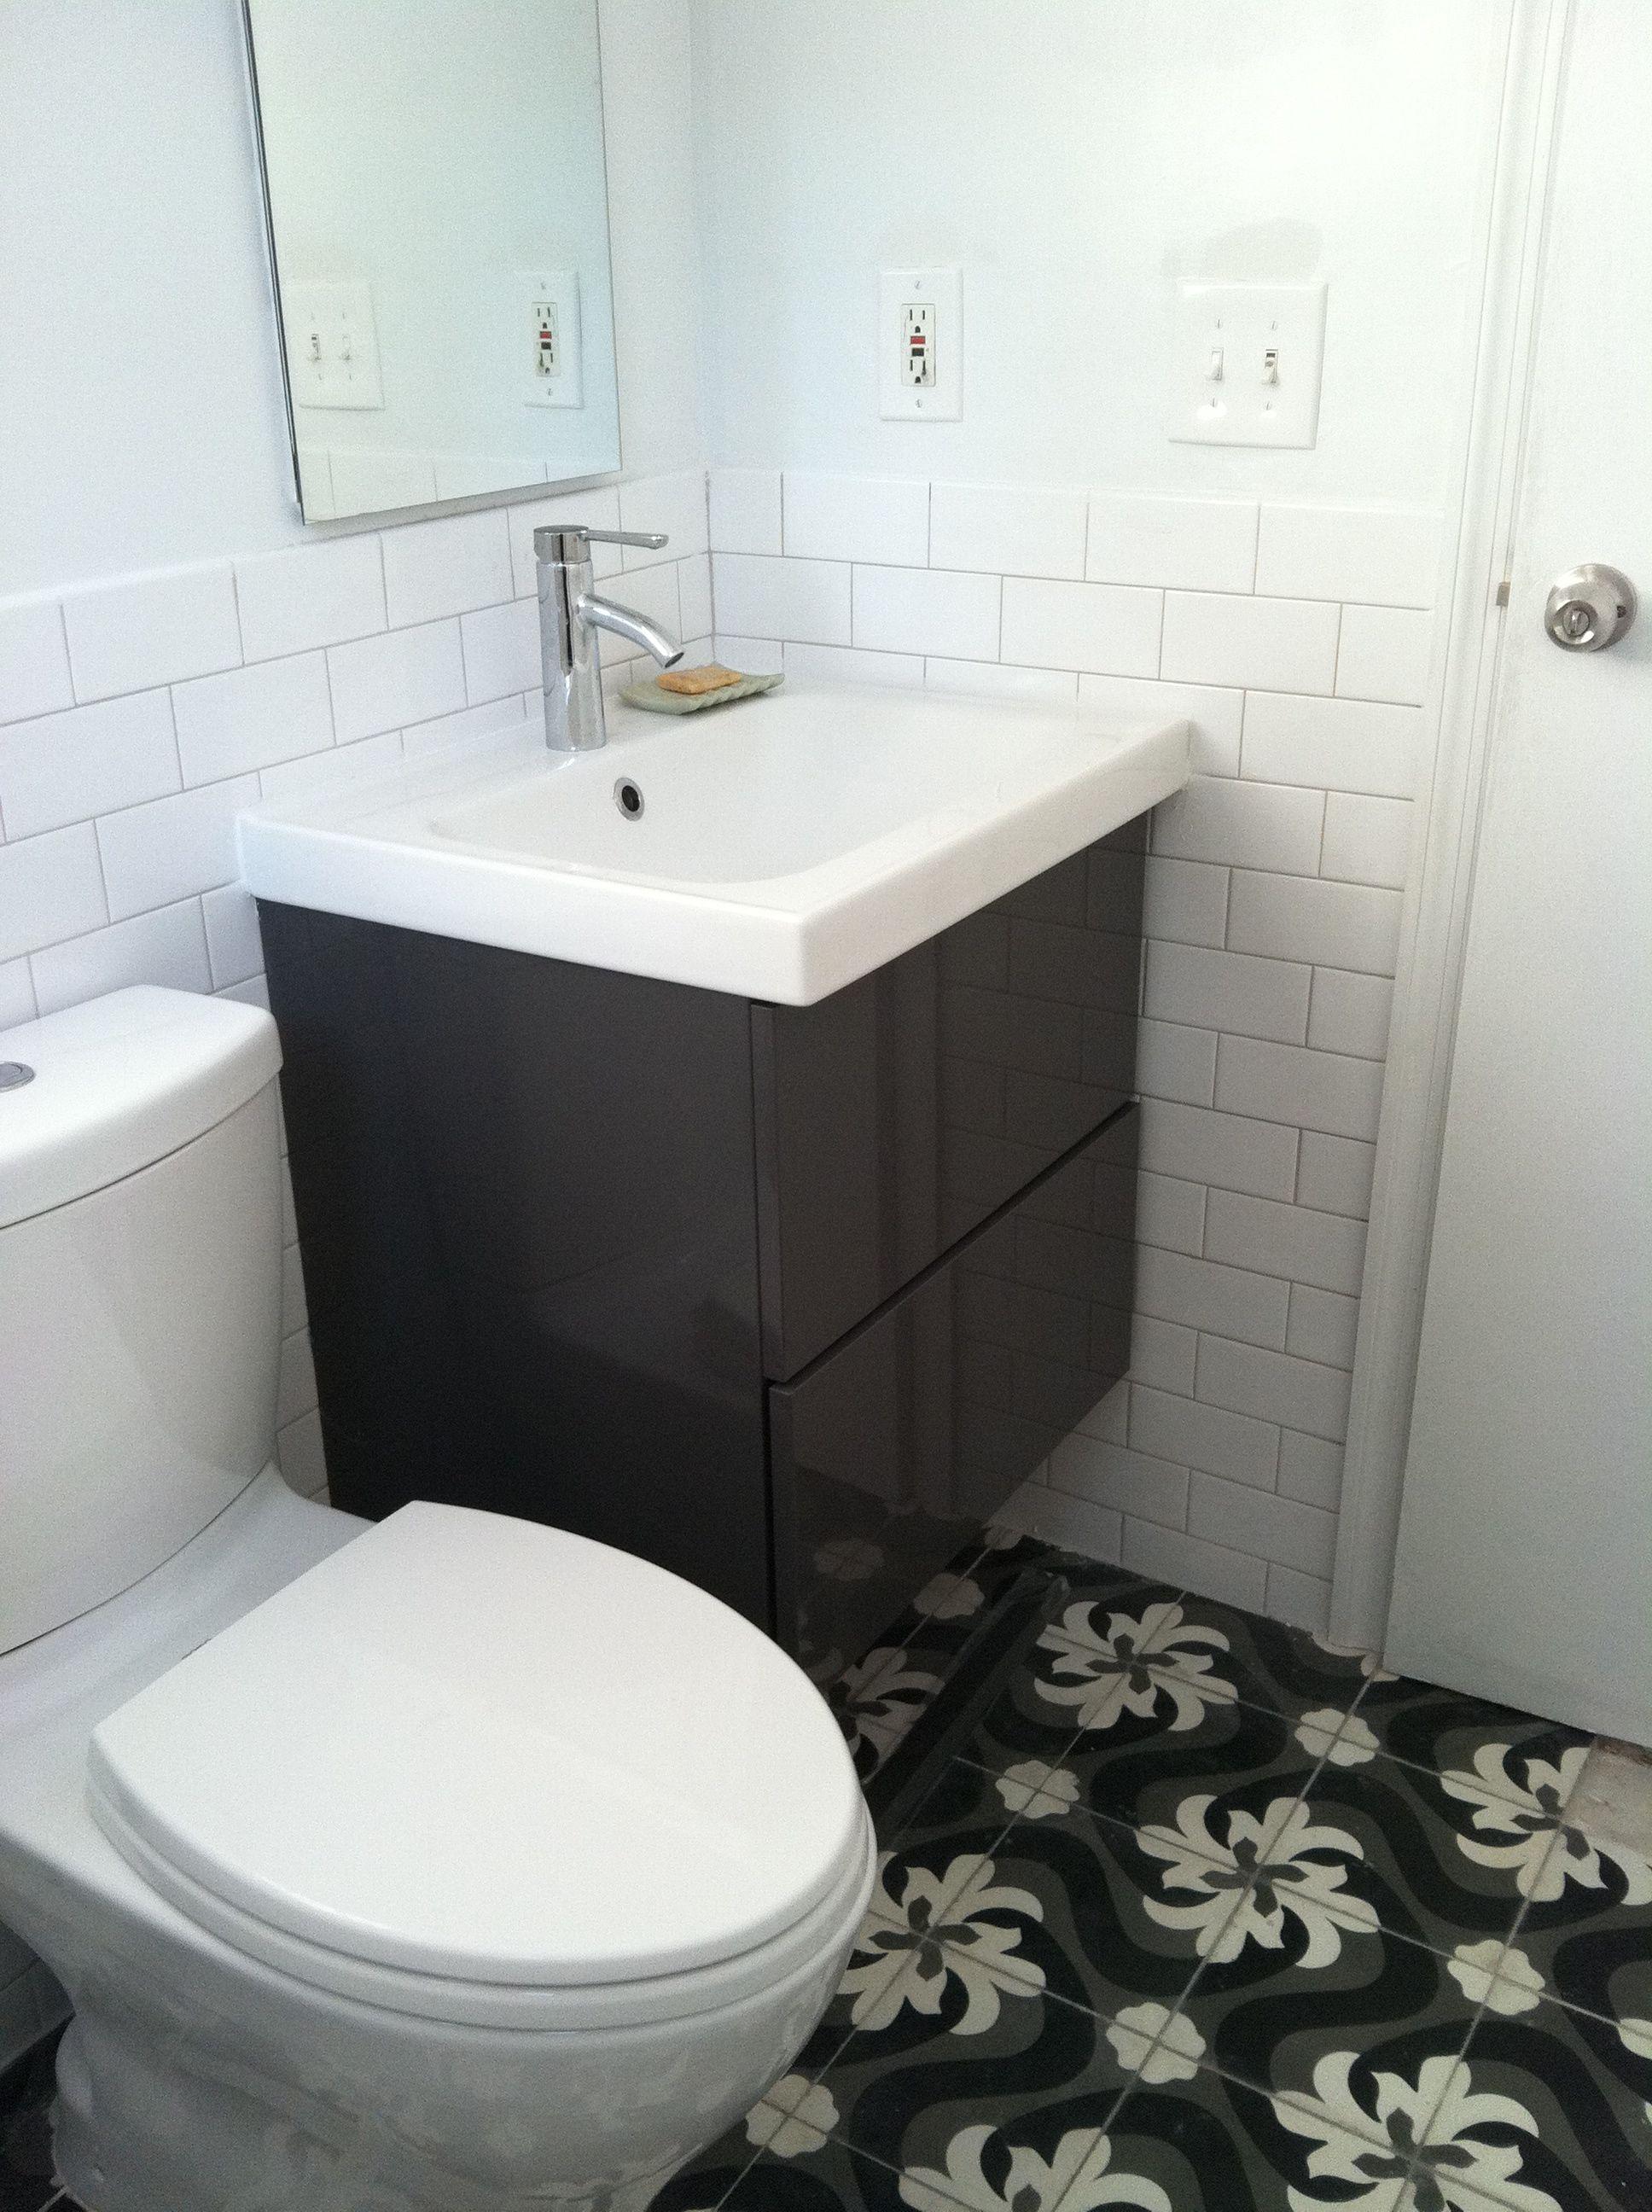 Ikea Godmorgon Vanity Interesting Floor Tiles Harlem Bathroom